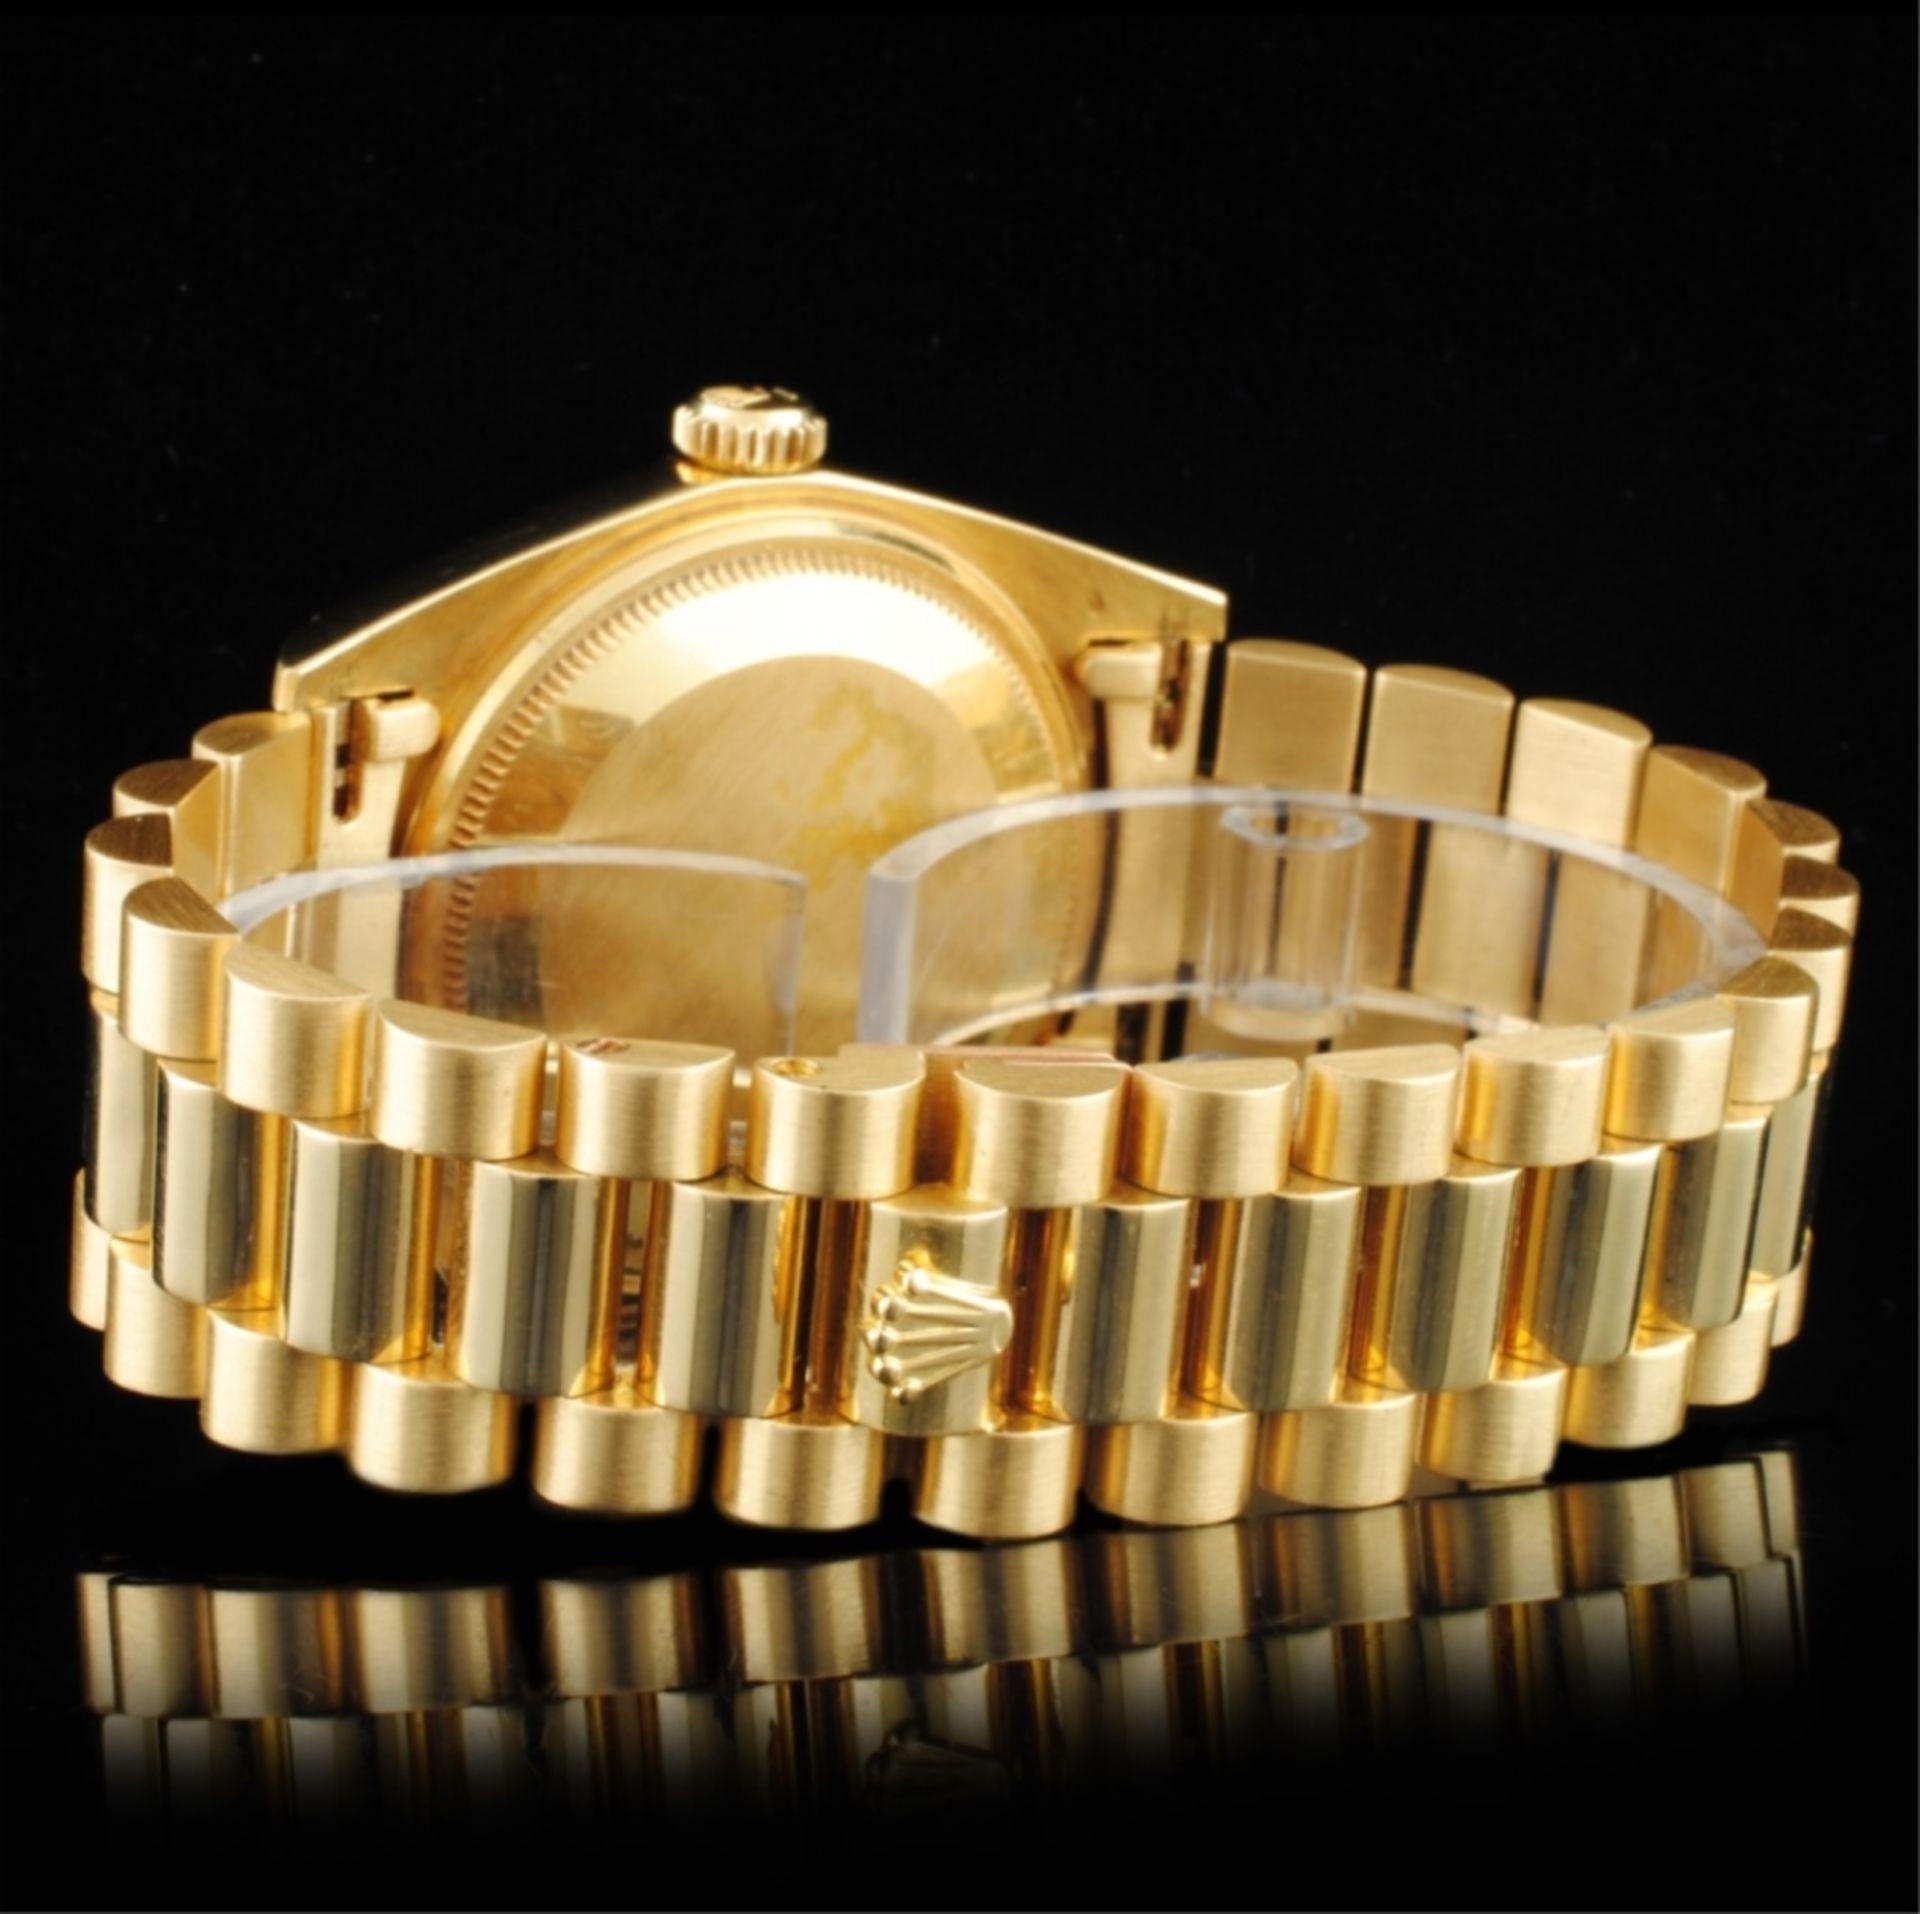 Rolex Day-Date 18K YG 36MM Wristwatch - Image 4 of 6